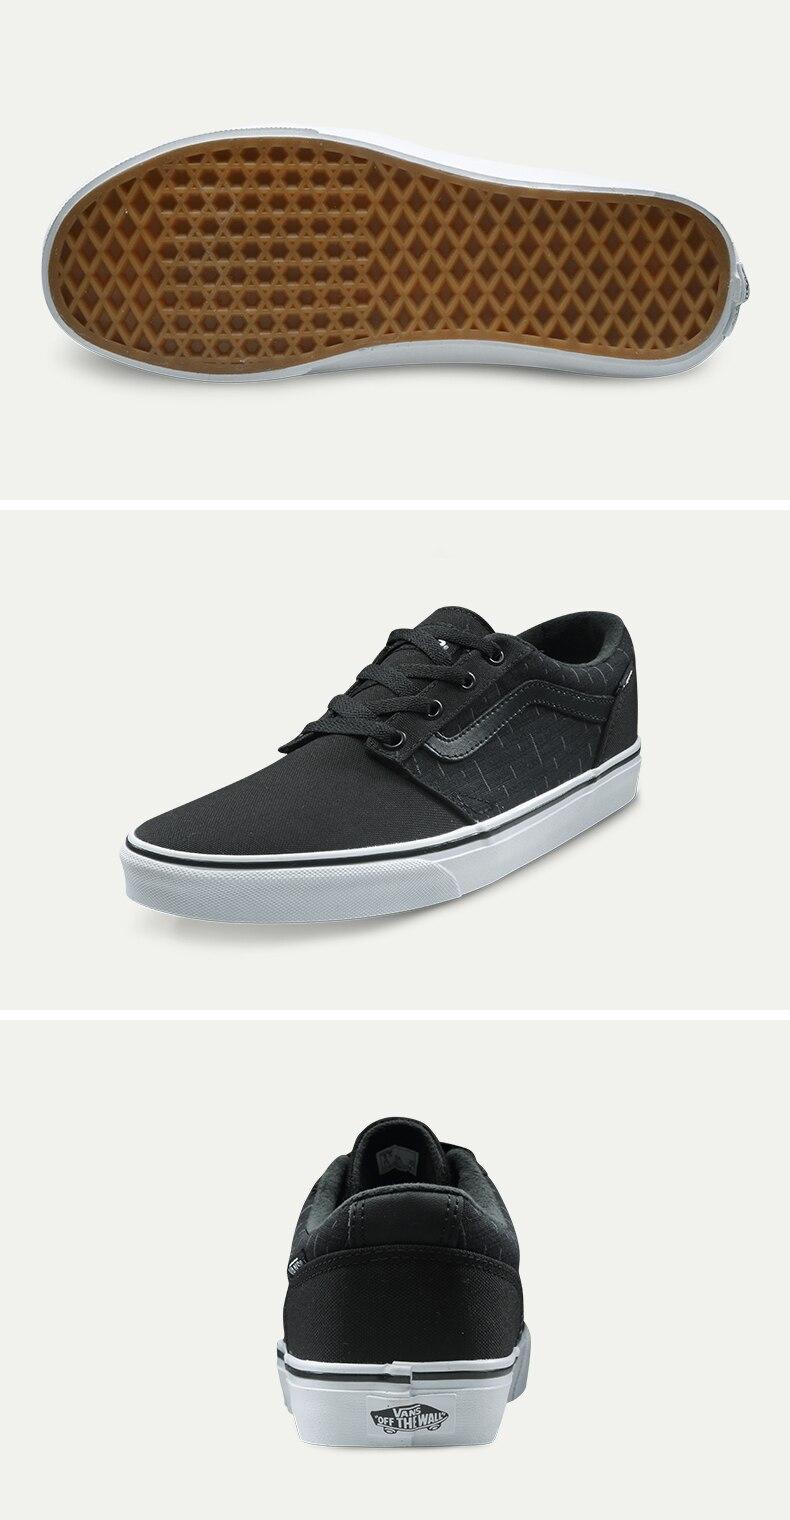 Original Vans Black and Purple and Blue Color Low-Top Men's Skateboarding Shoes Sport Shoes Sneakers